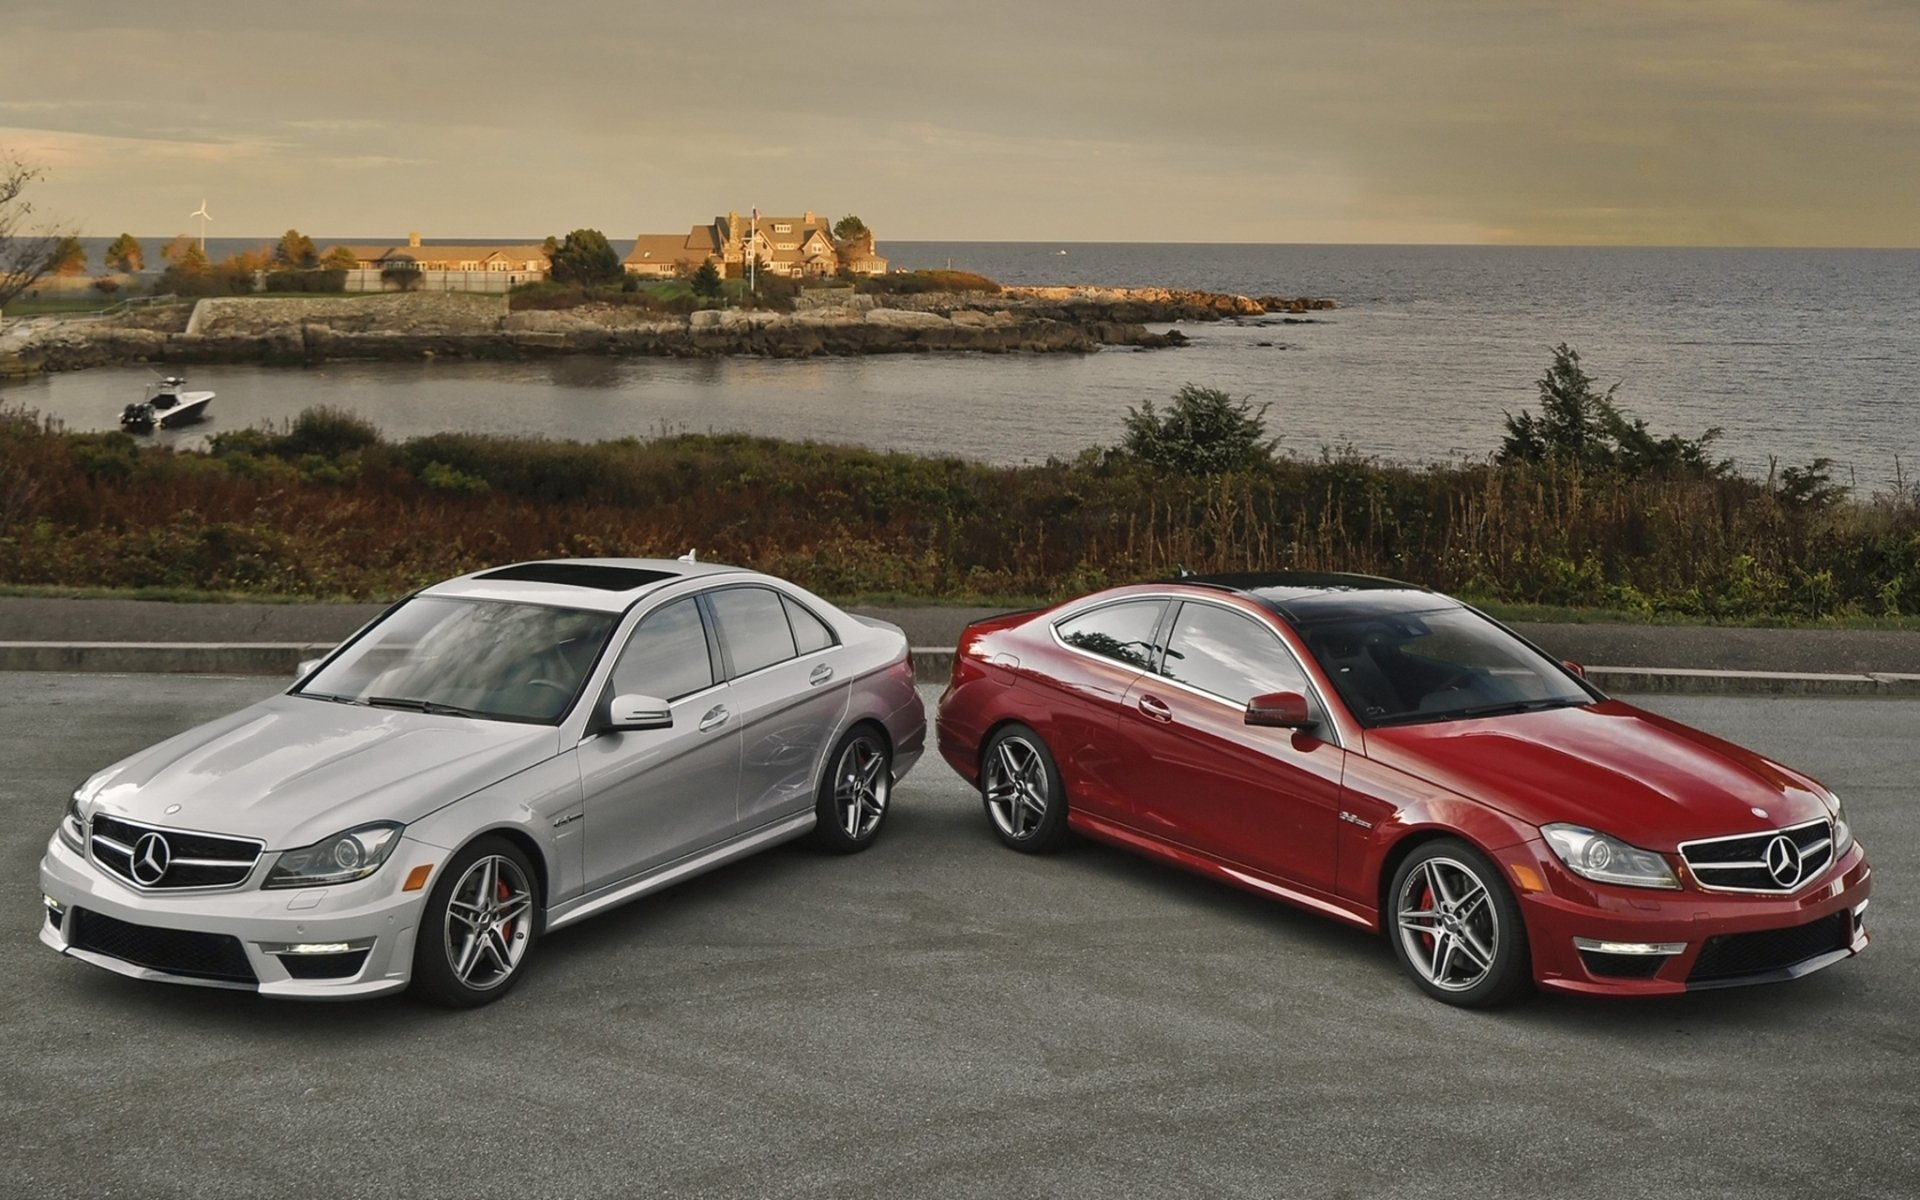 Mercedes-Benz осуществляет доставку машин на дом